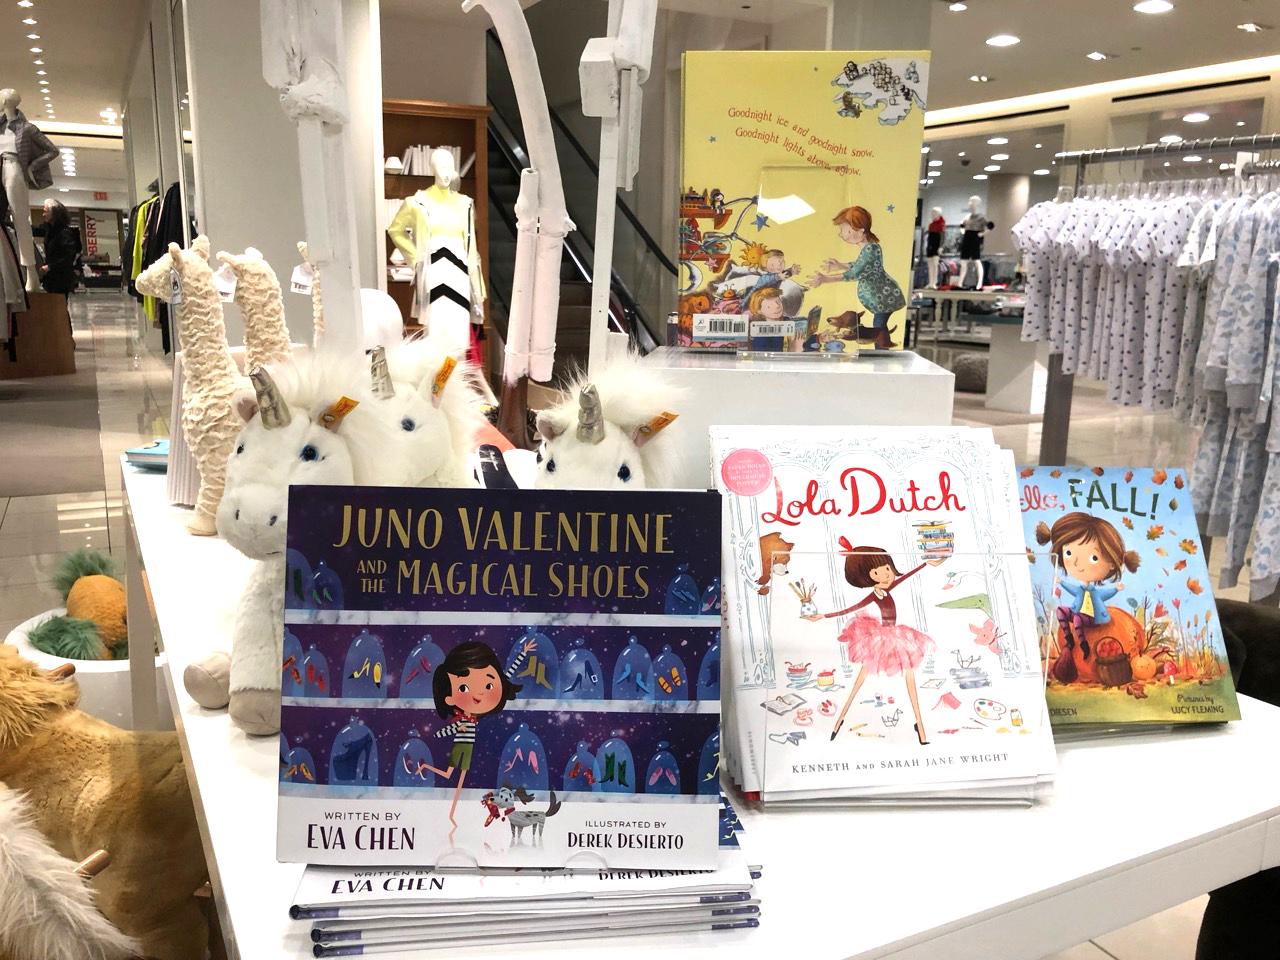 Spotting Eva Chen's published children's book - Juno Valentine!